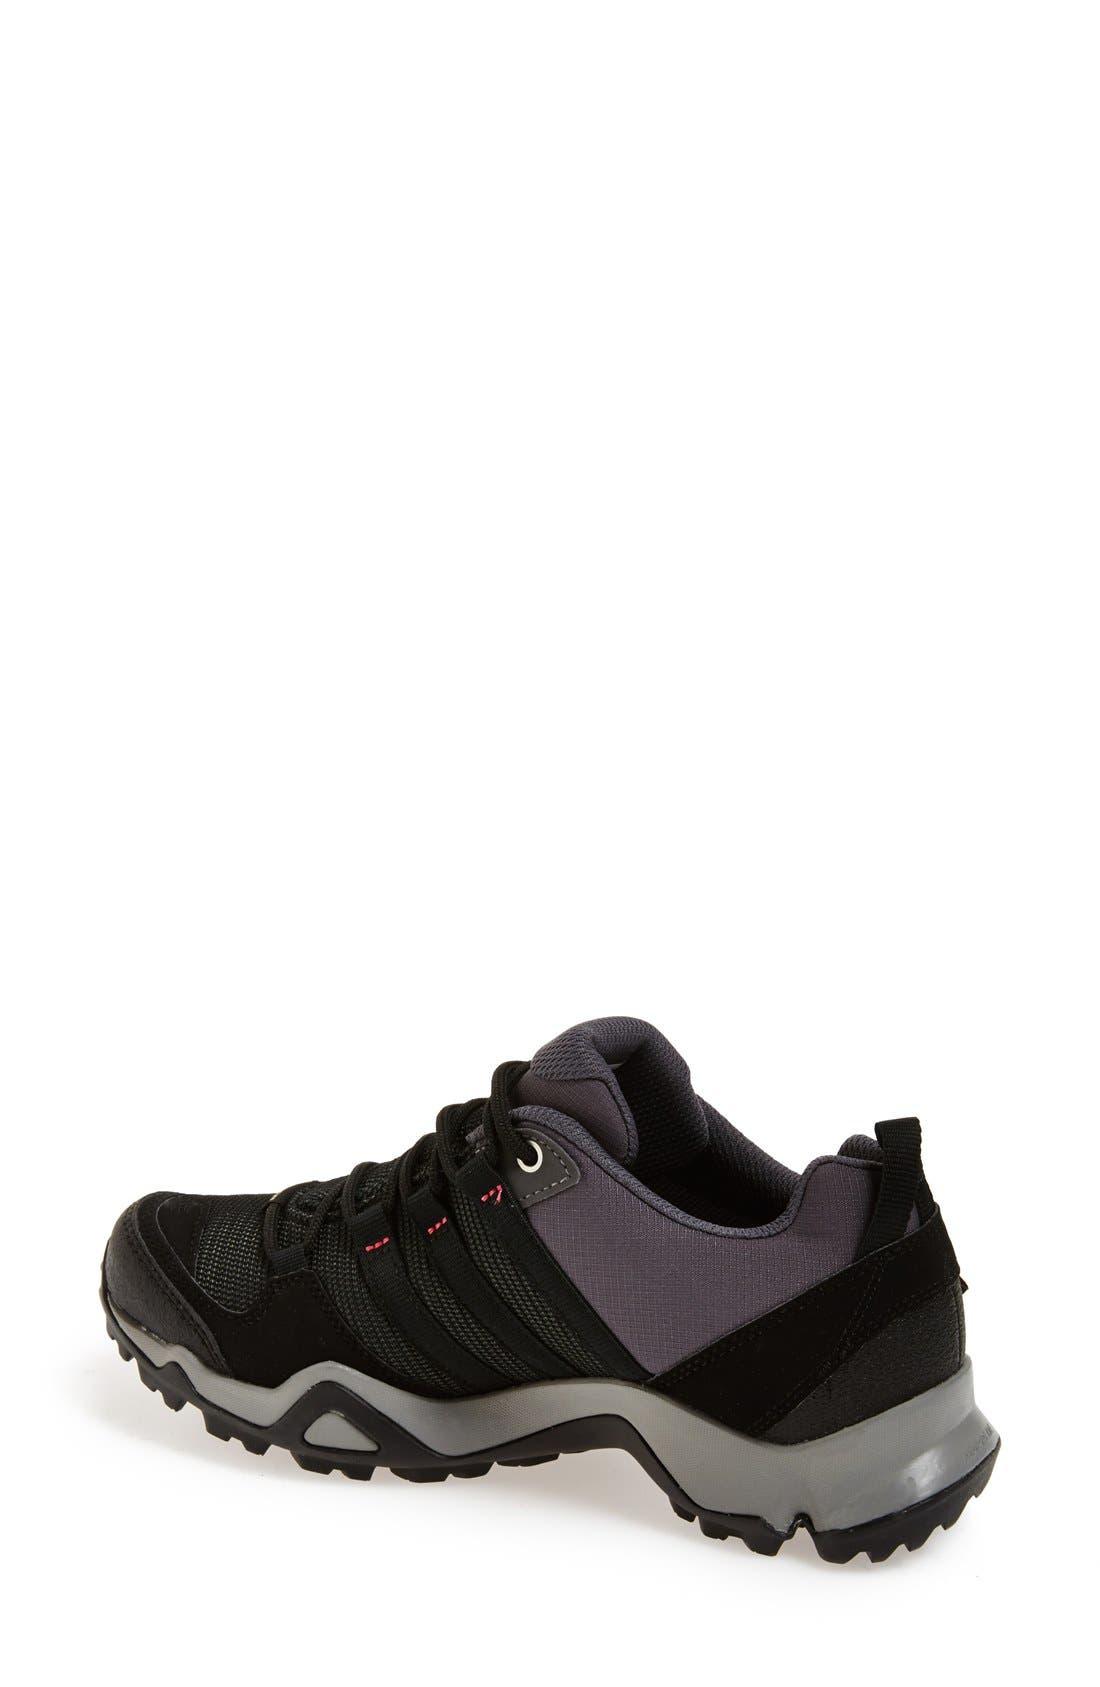 'AX2' Hiking Shoe,                             Alternate thumbnail 2, color,                             010